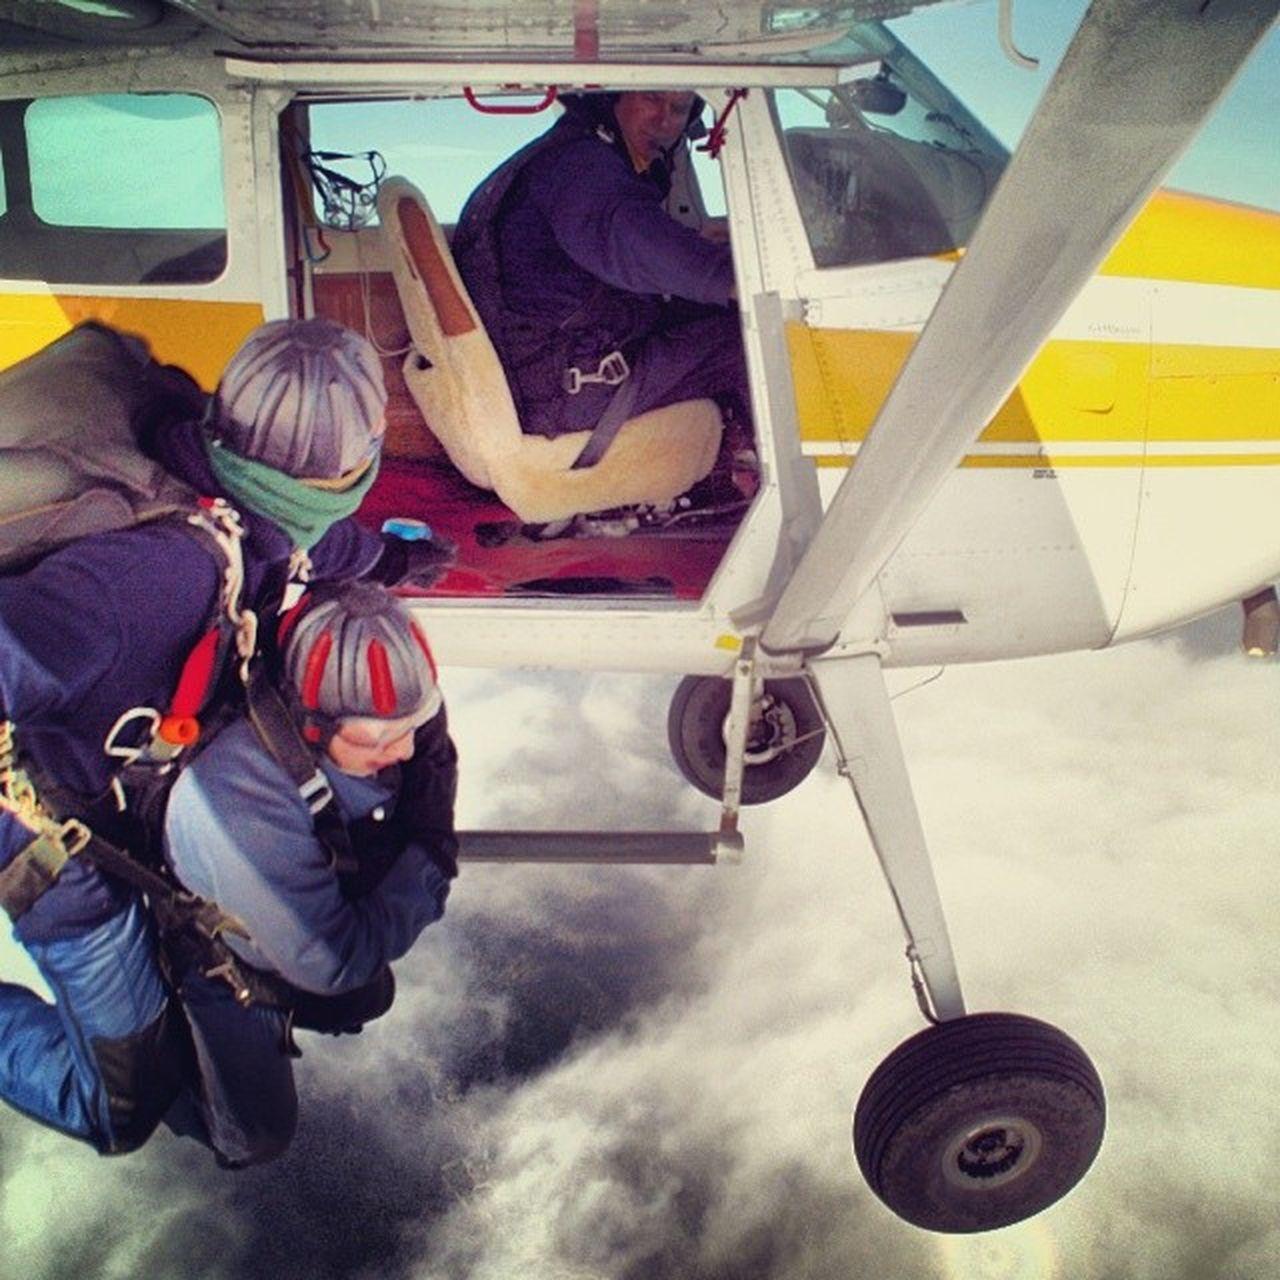 NZ New_Zealand TBT  Sky_Dive Parachute Jump Plane 2008 Above_The_Clouds Franz_Josef Glacier Travel Tourist Scary Adrenaline Rush Fun Free Fall Clouds Action Life Bucketlist Whoopeeeeeeee Adventure Club